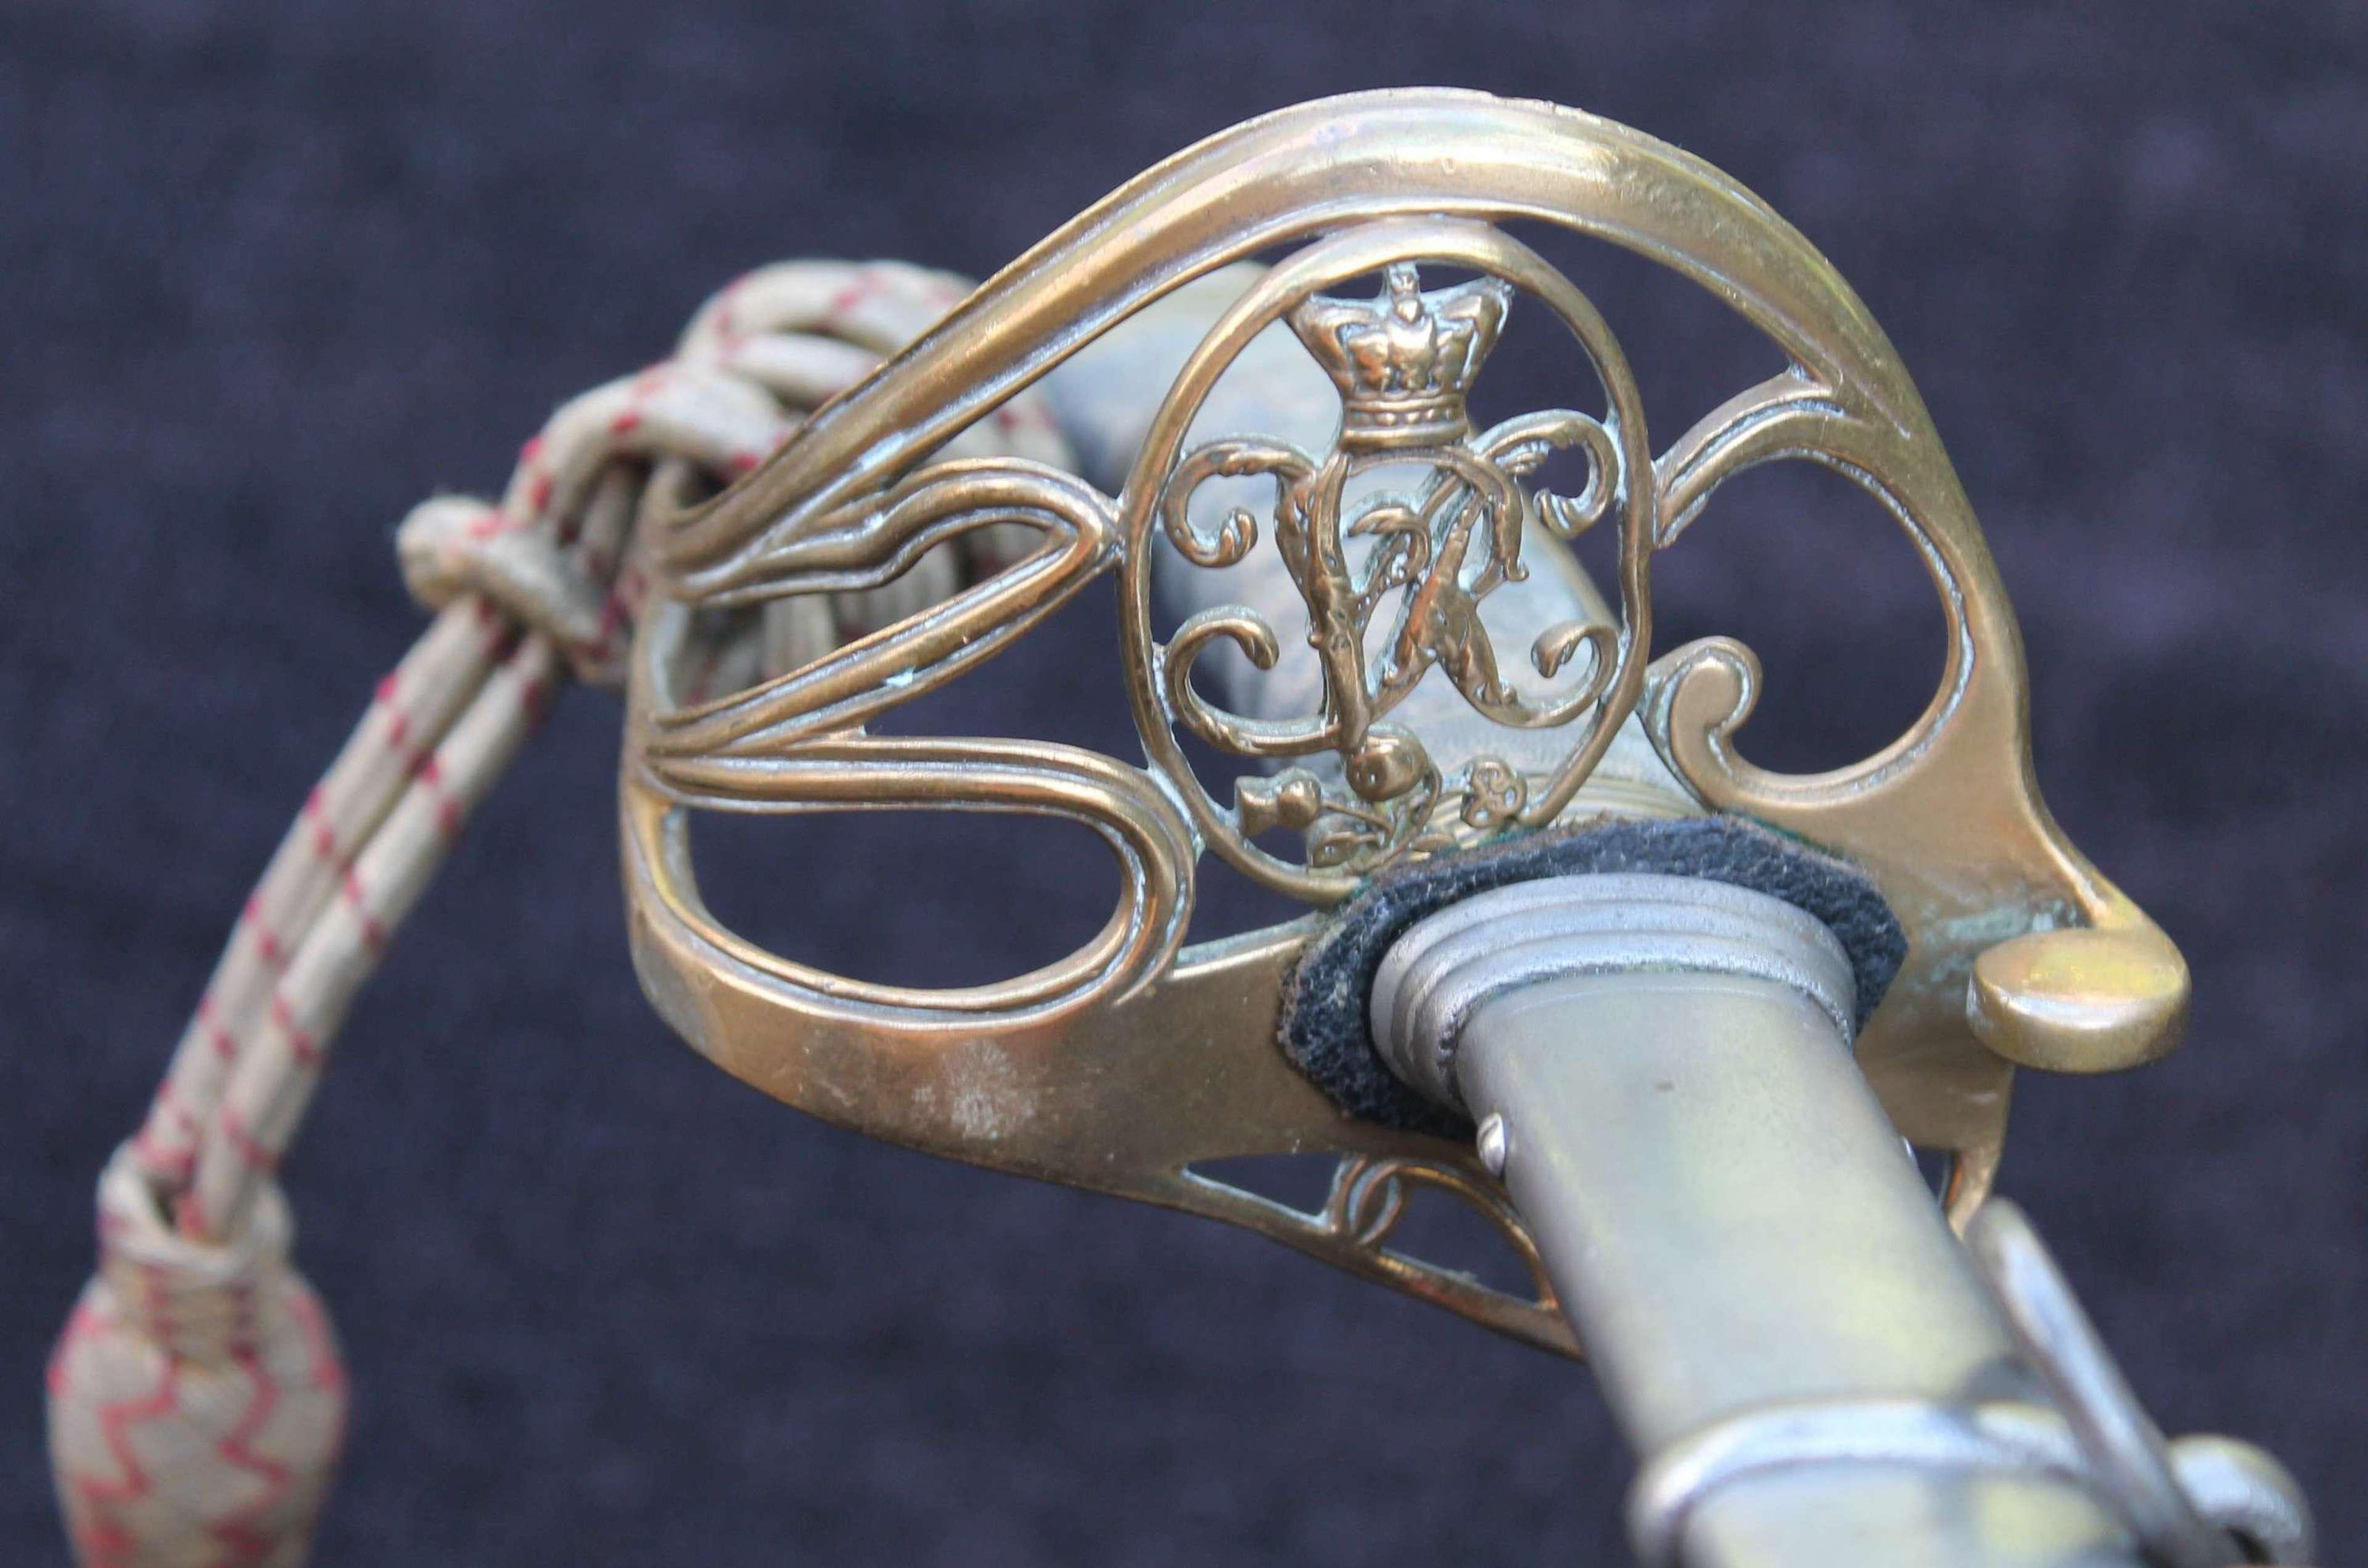 Victorian King's Liverpool Regiment Officers Sword